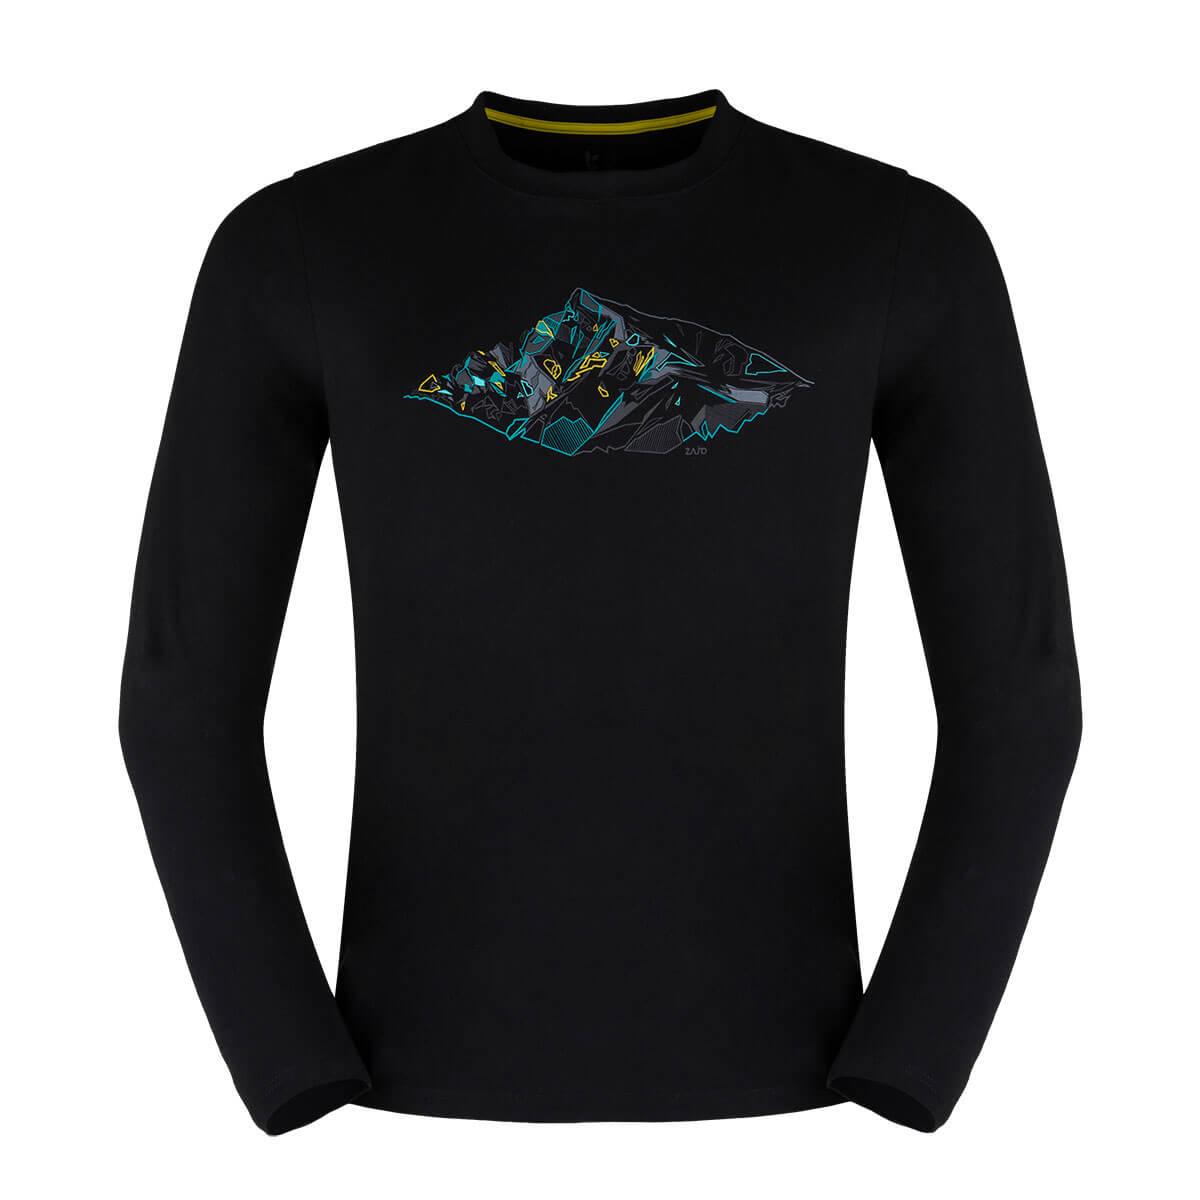 Zajo Bormio T-shirt LS Black Peak pánske tričko - veľkosť S